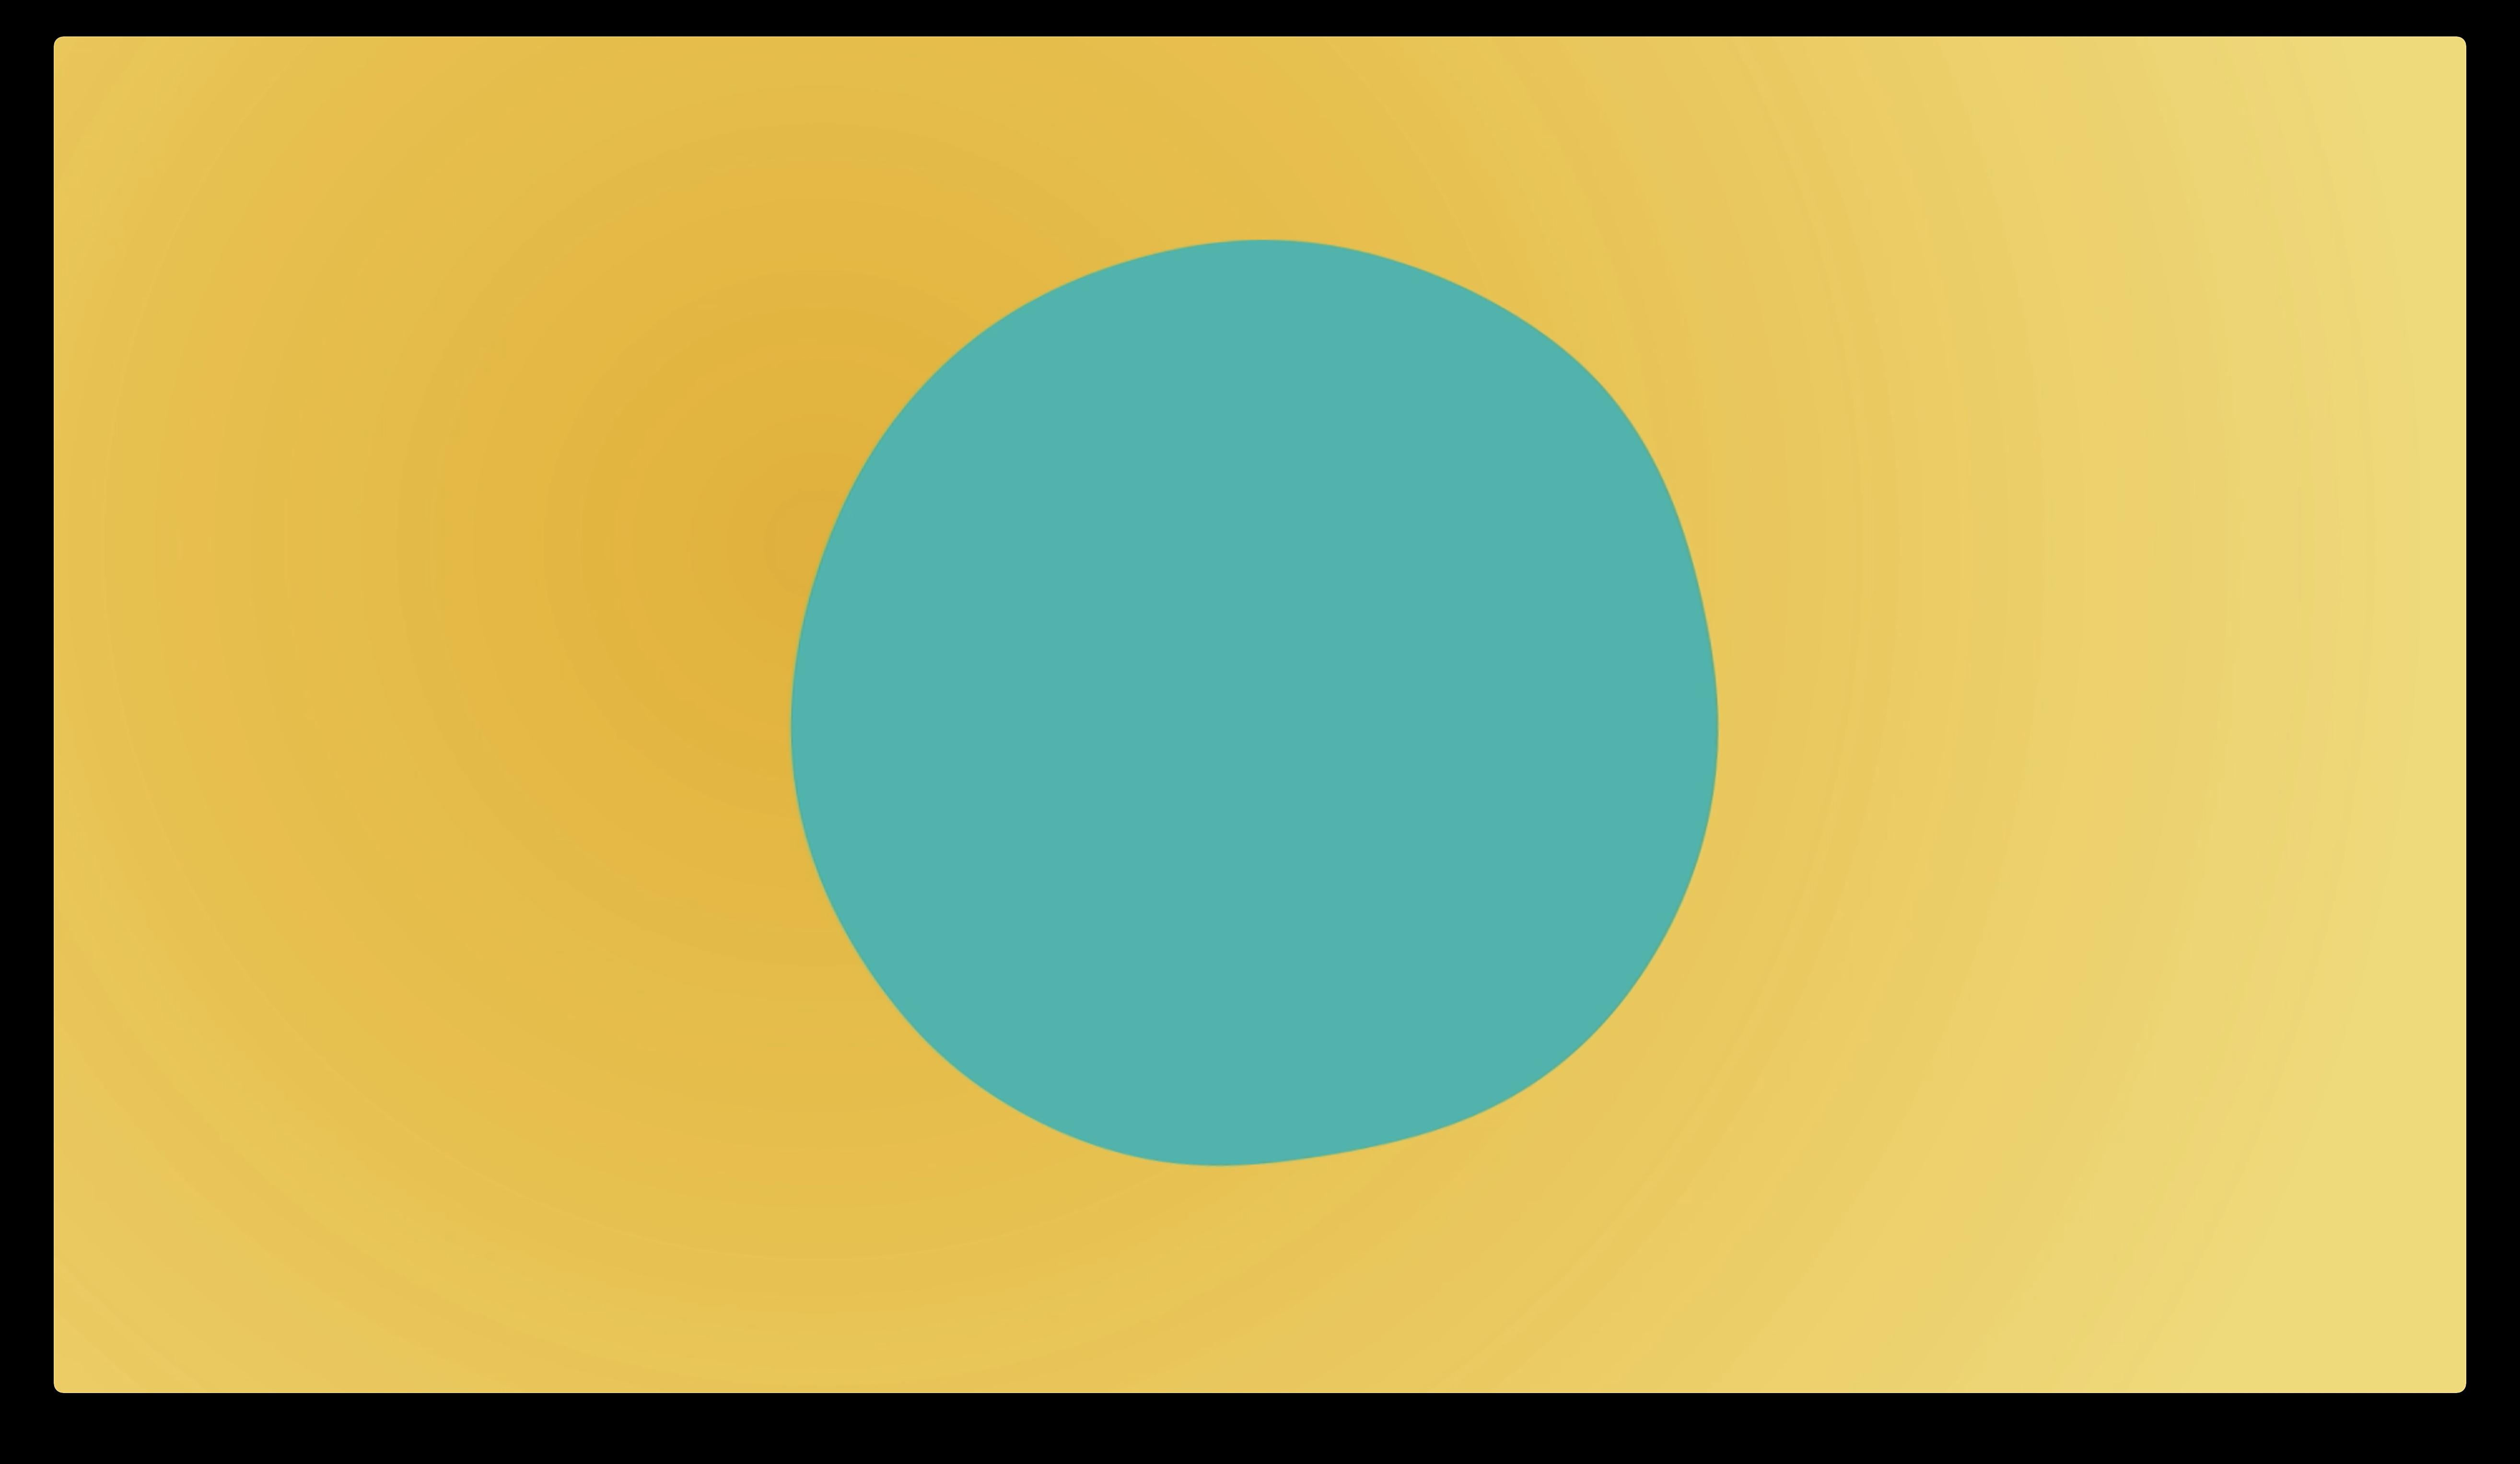 Background Placeholder